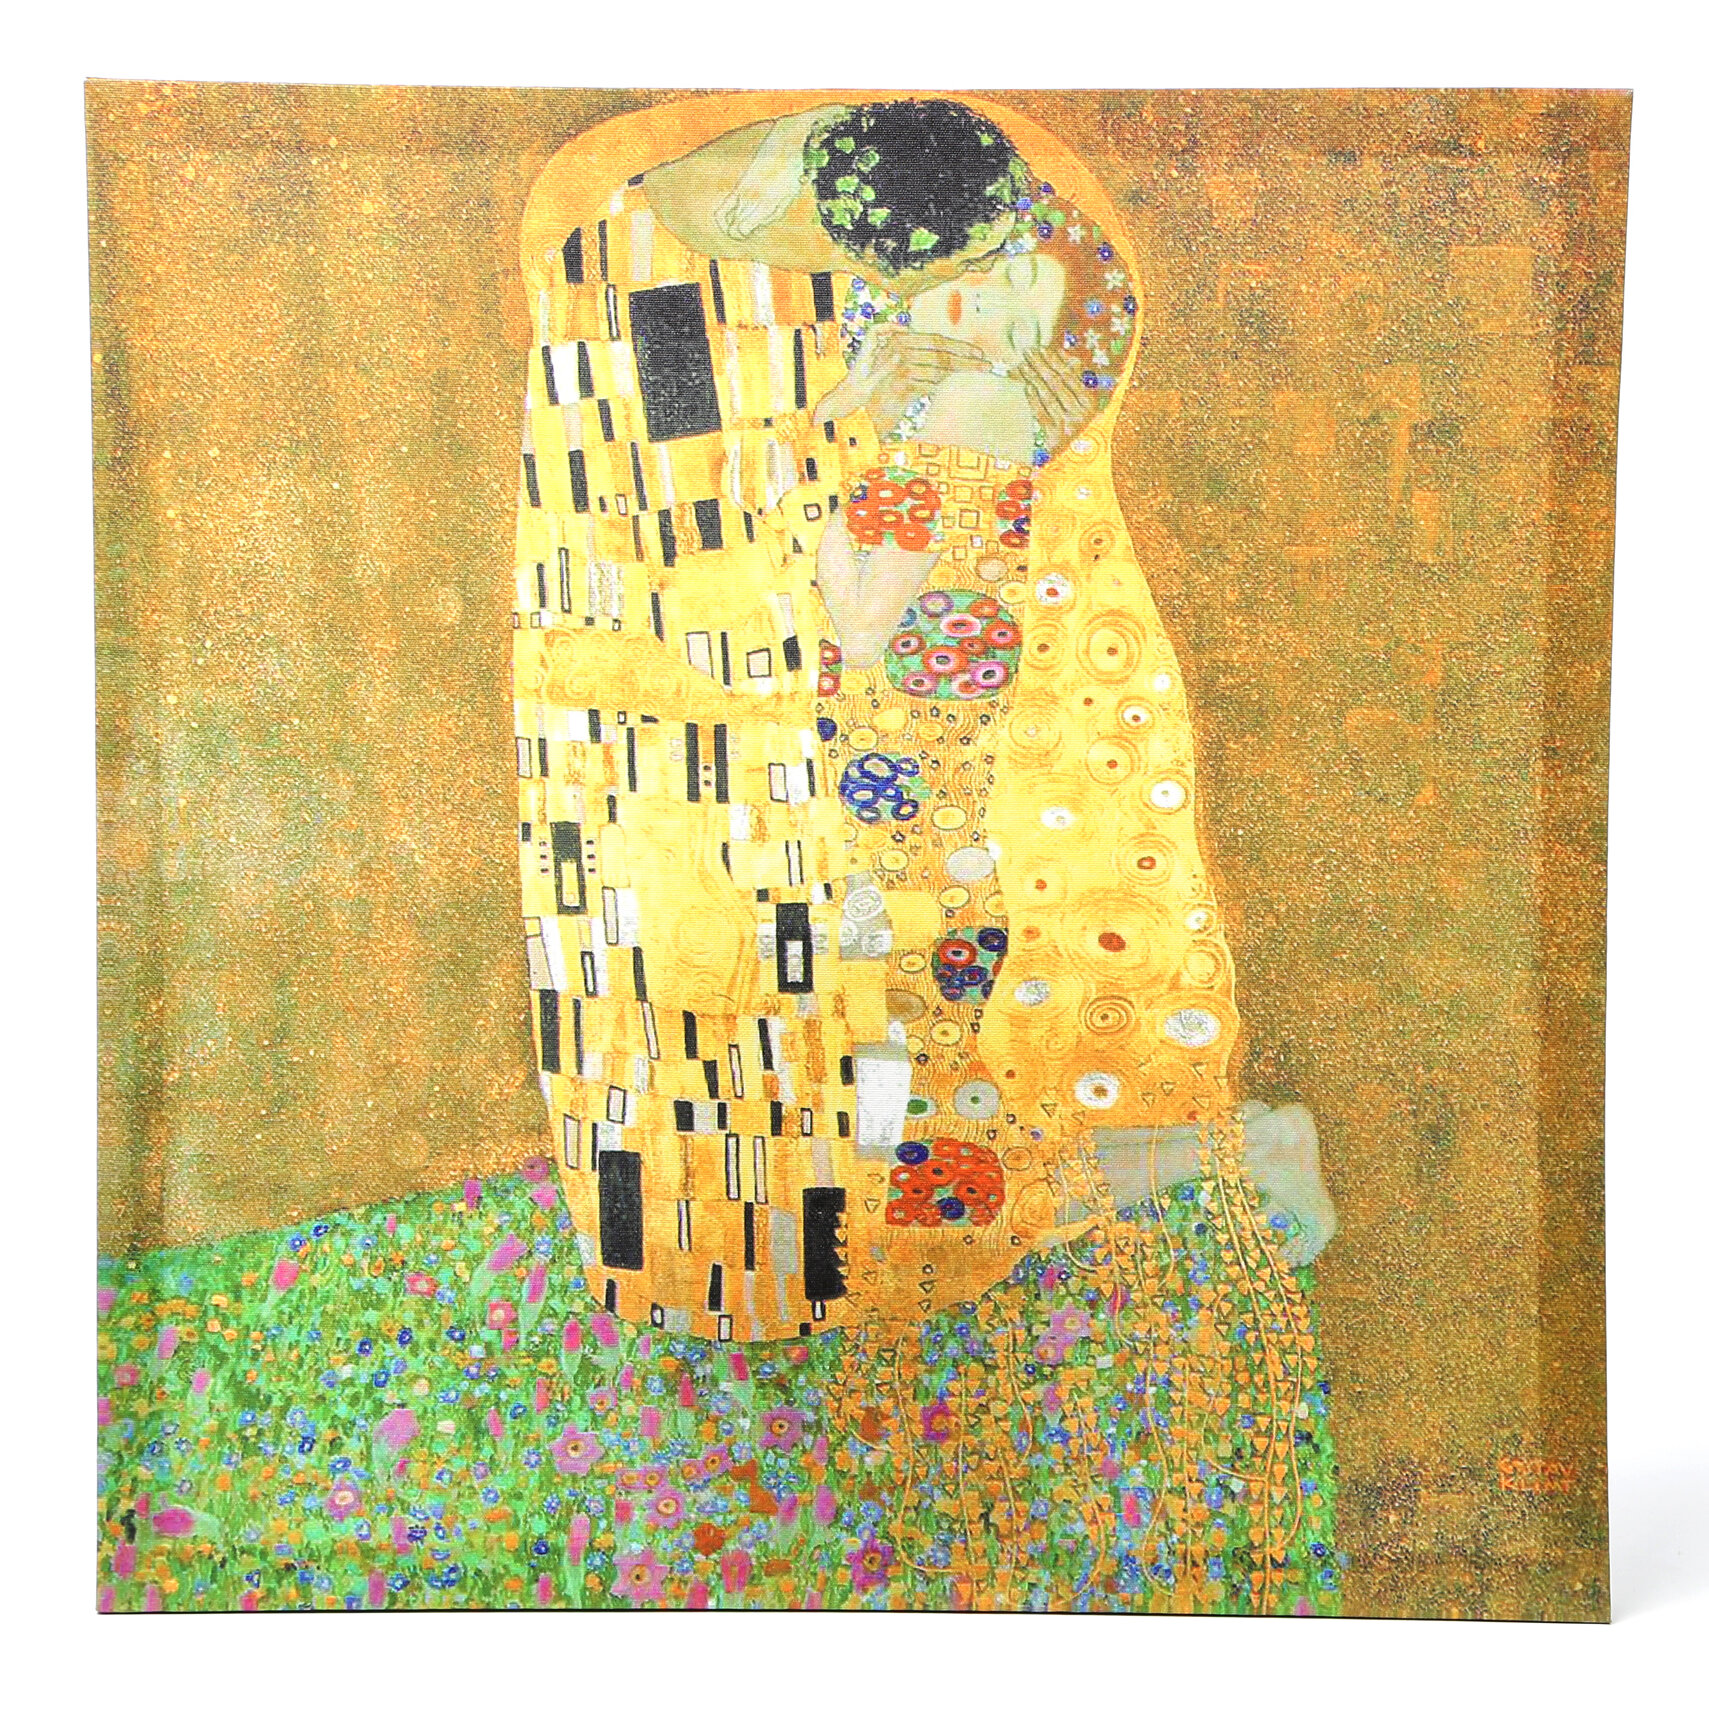 Home furniture diy home decor the kiss oil paint by gustav klimt re print on wood framed